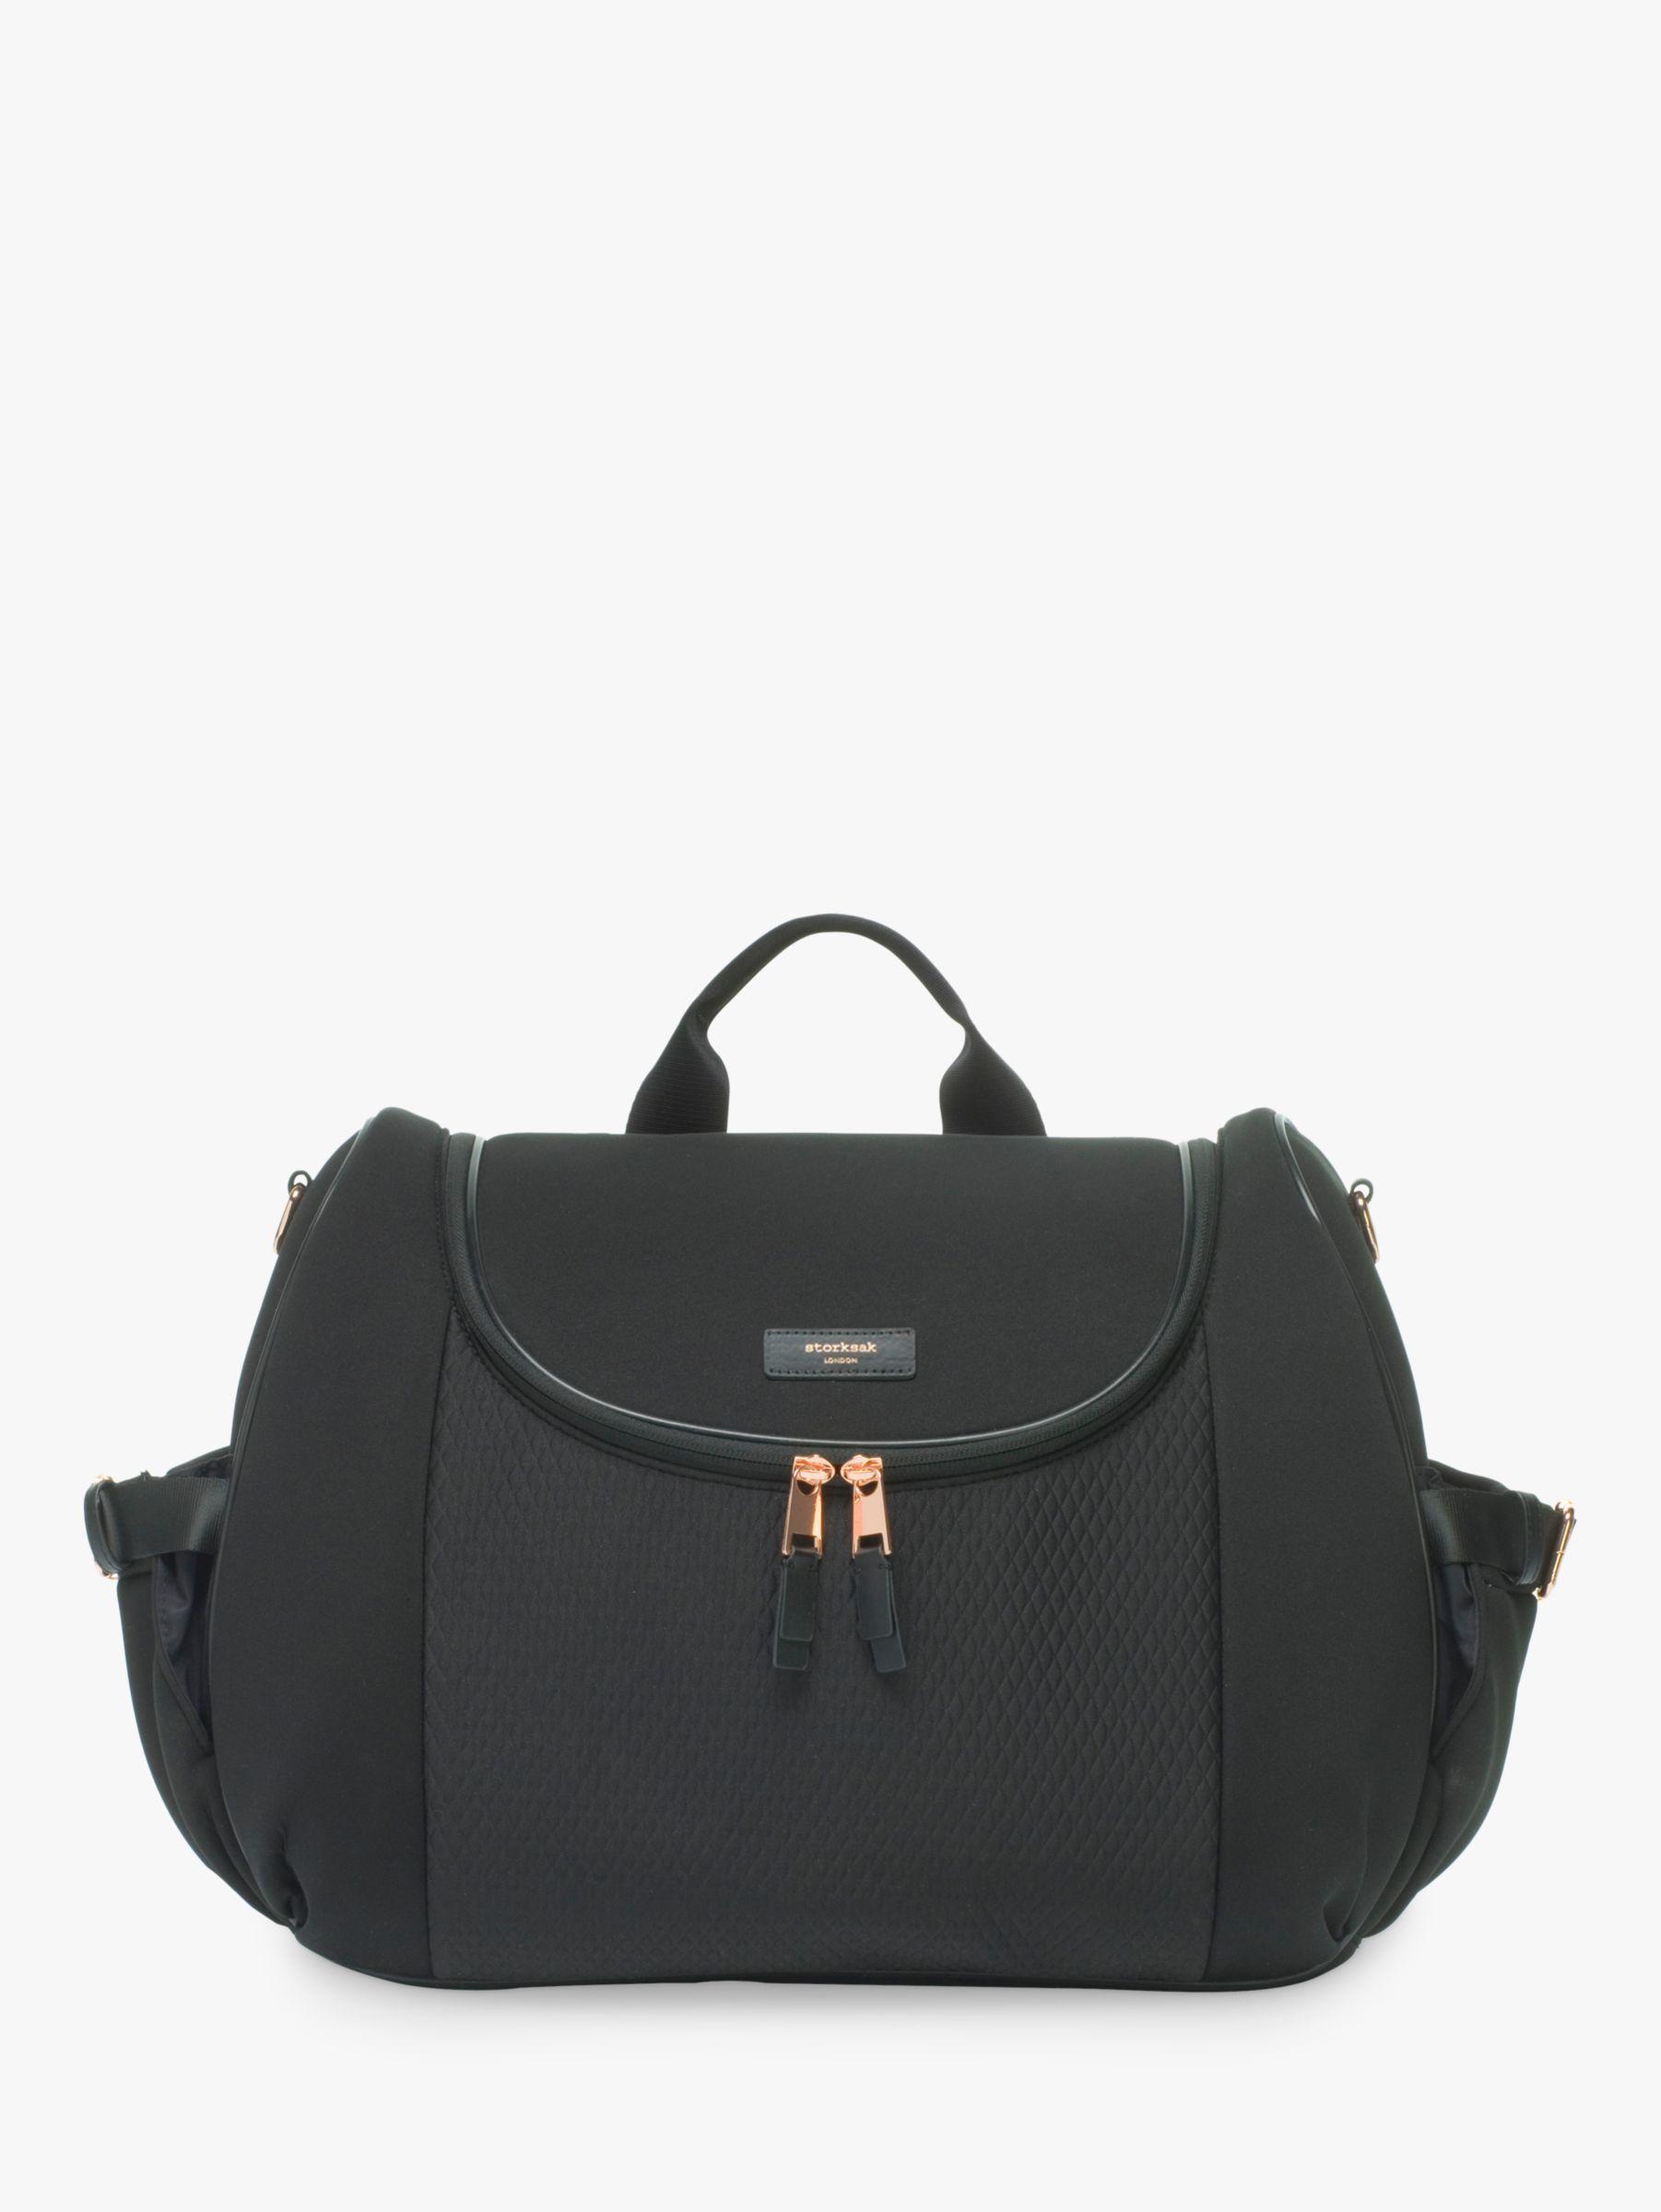 Storksak Storksak Poppy Luxe Convertible Backpack Changing Bag, Black Scuba